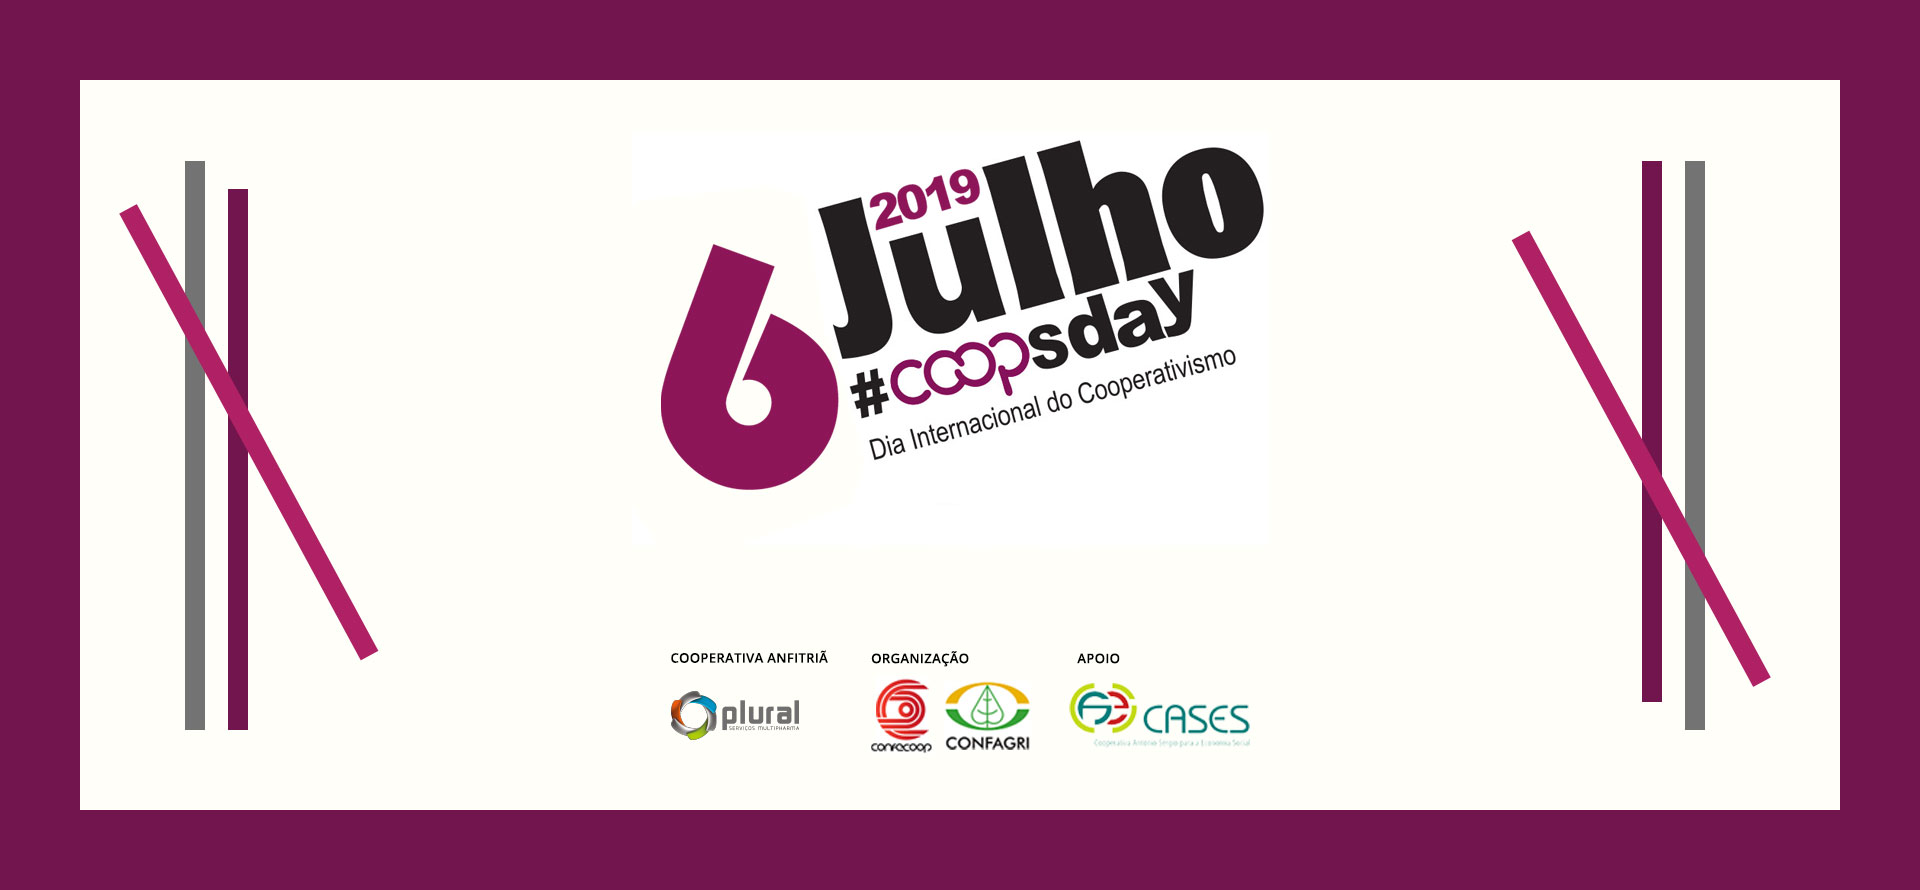 coopsday-dia internacional do cooperativismo-mini.jpg